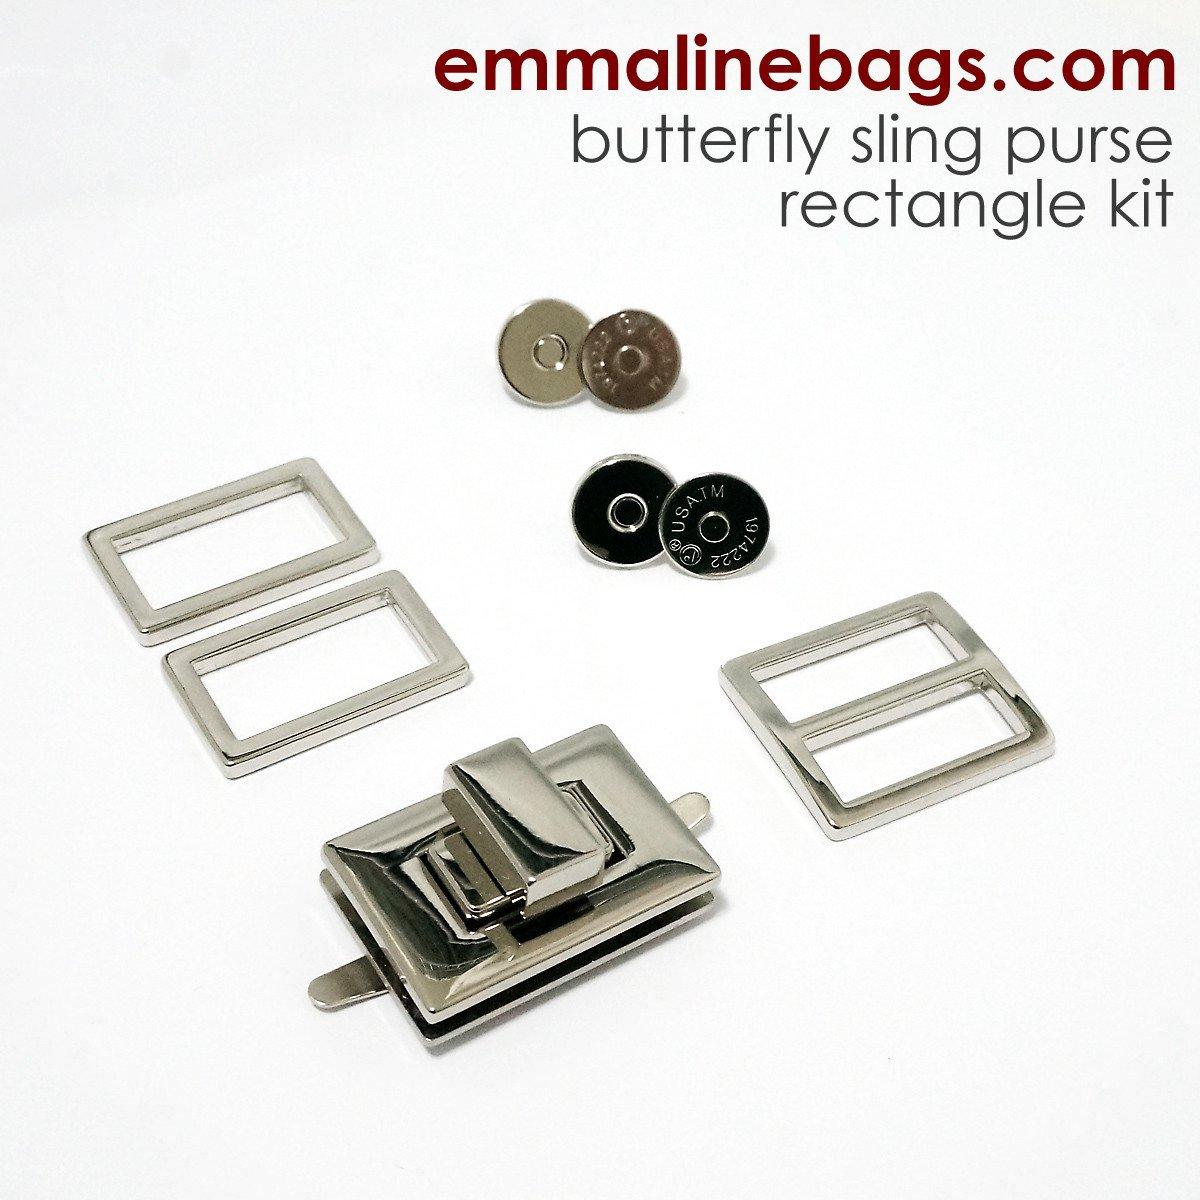 Emmaline - the Butterfly Sling Hardware Kit - Square Lock Nickel